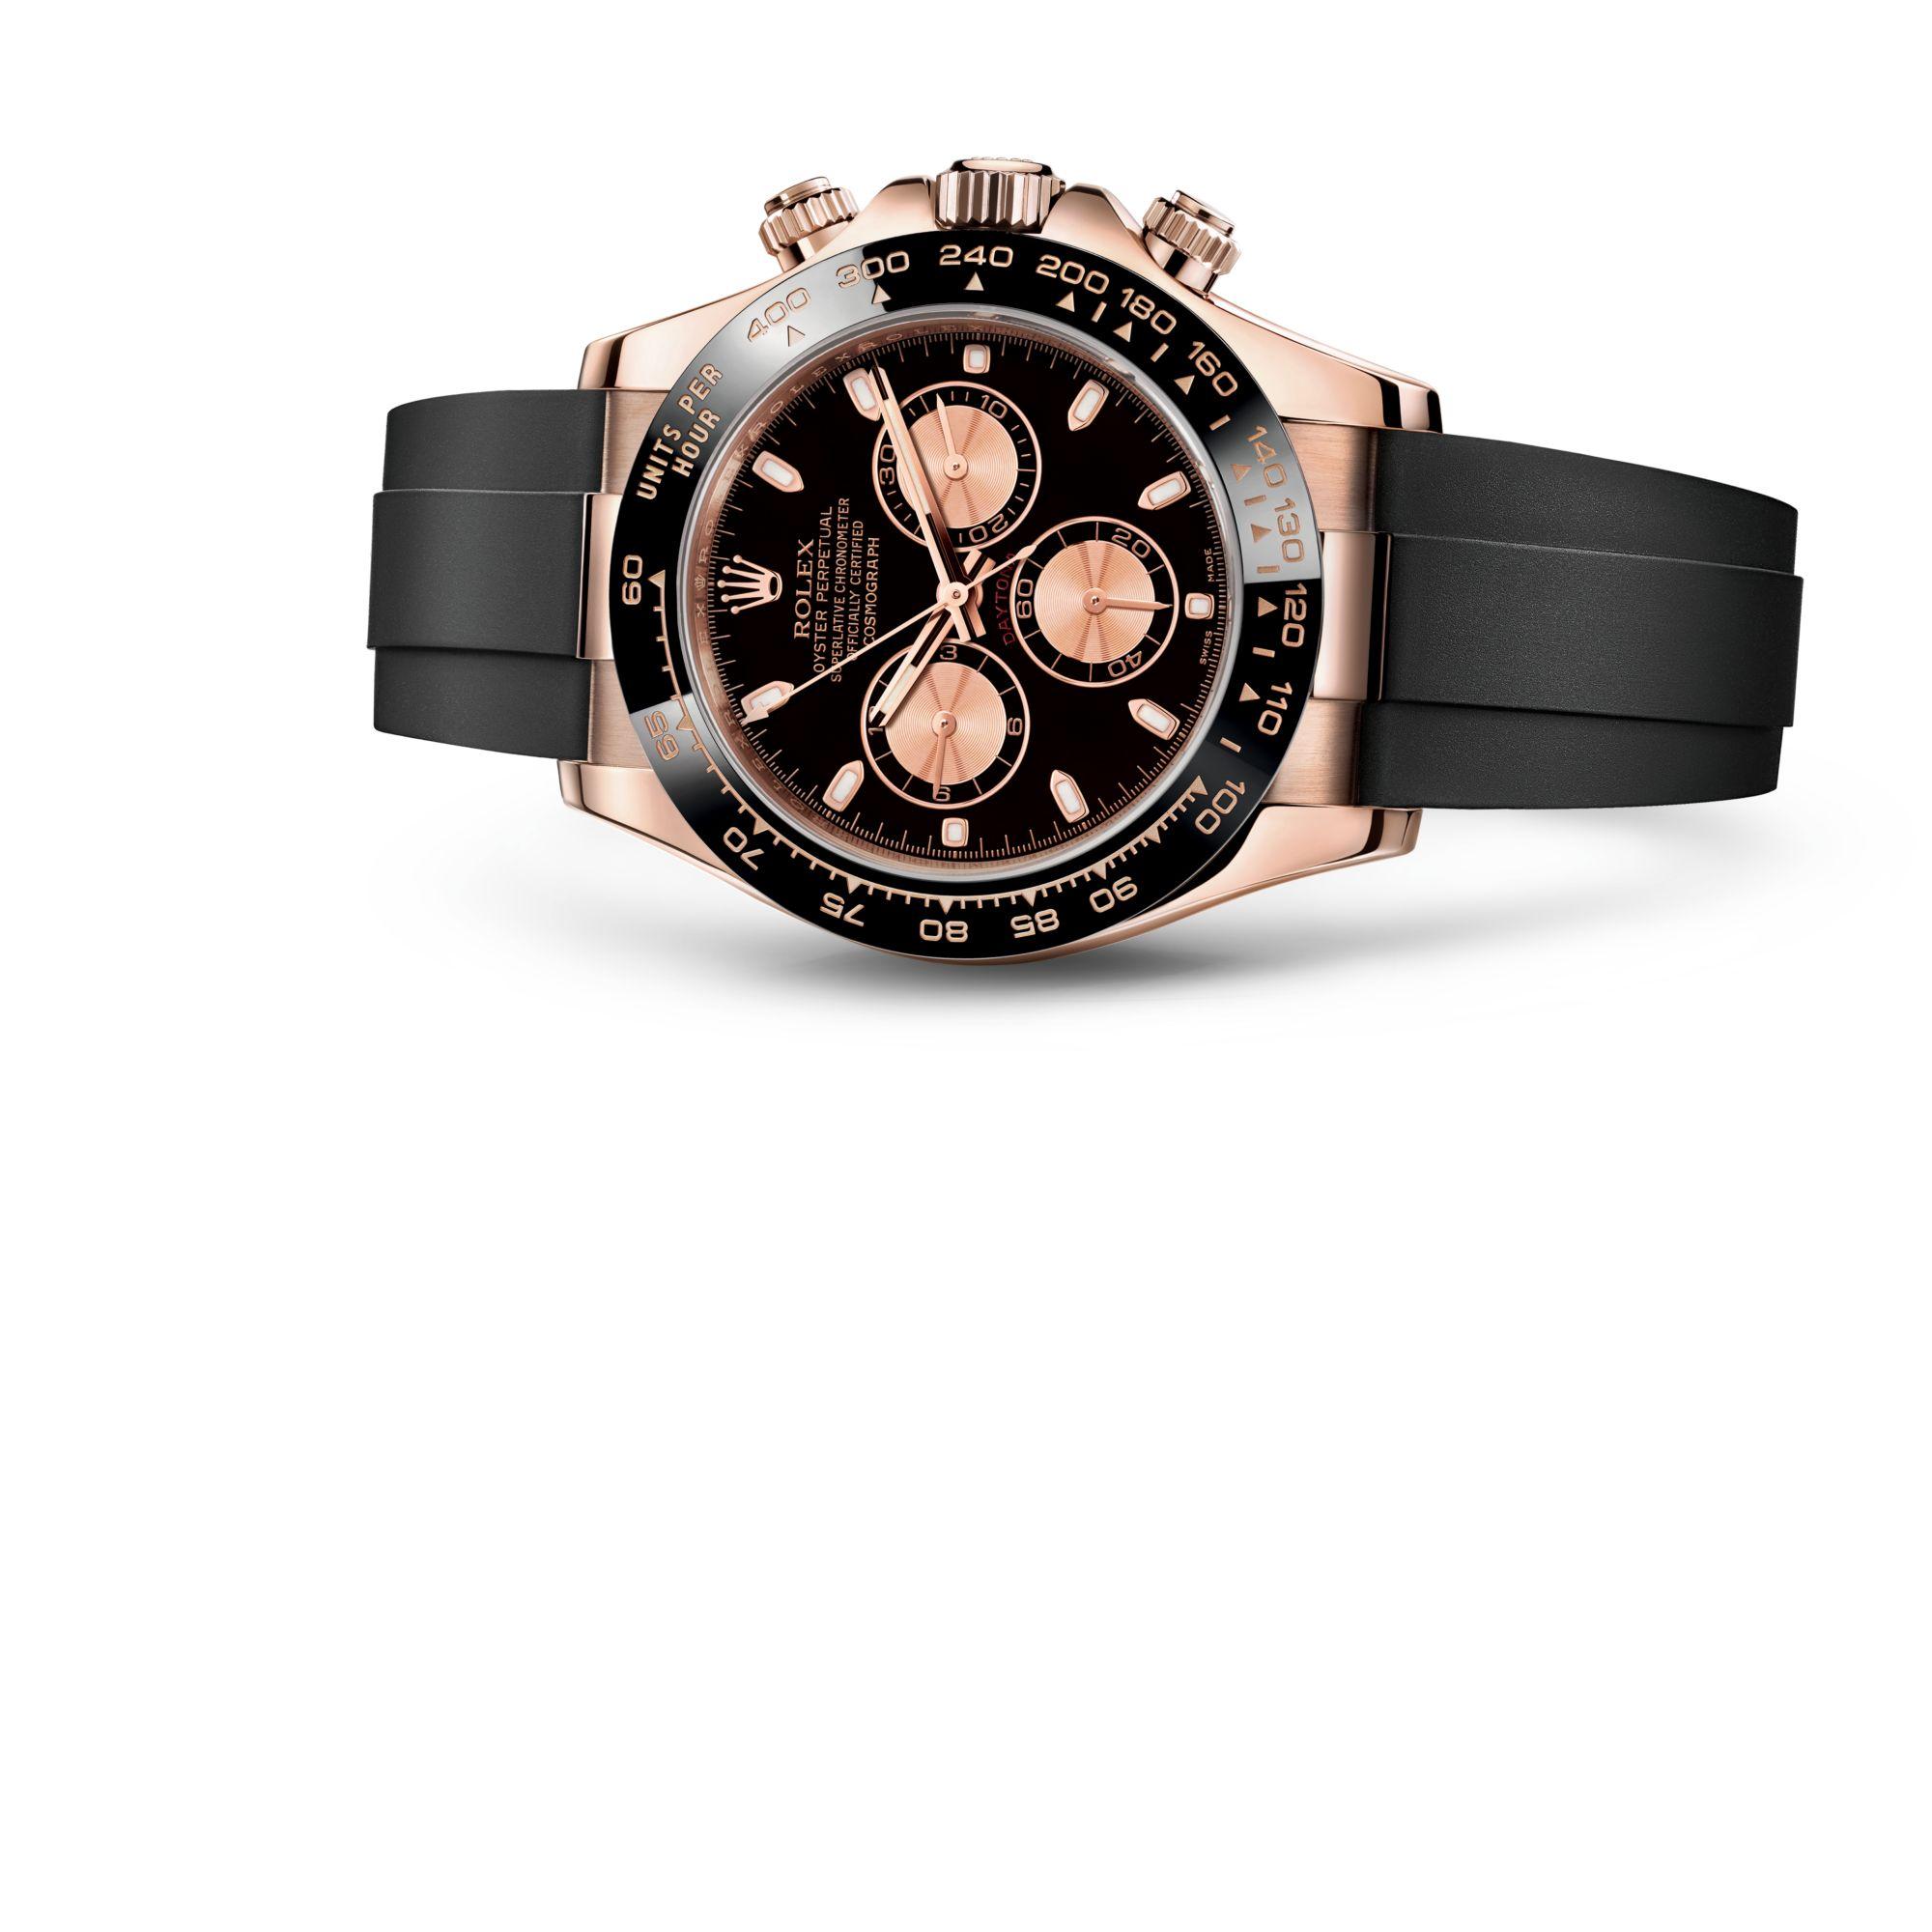 Rolex Cosmograph Daytona M116515LN-0012